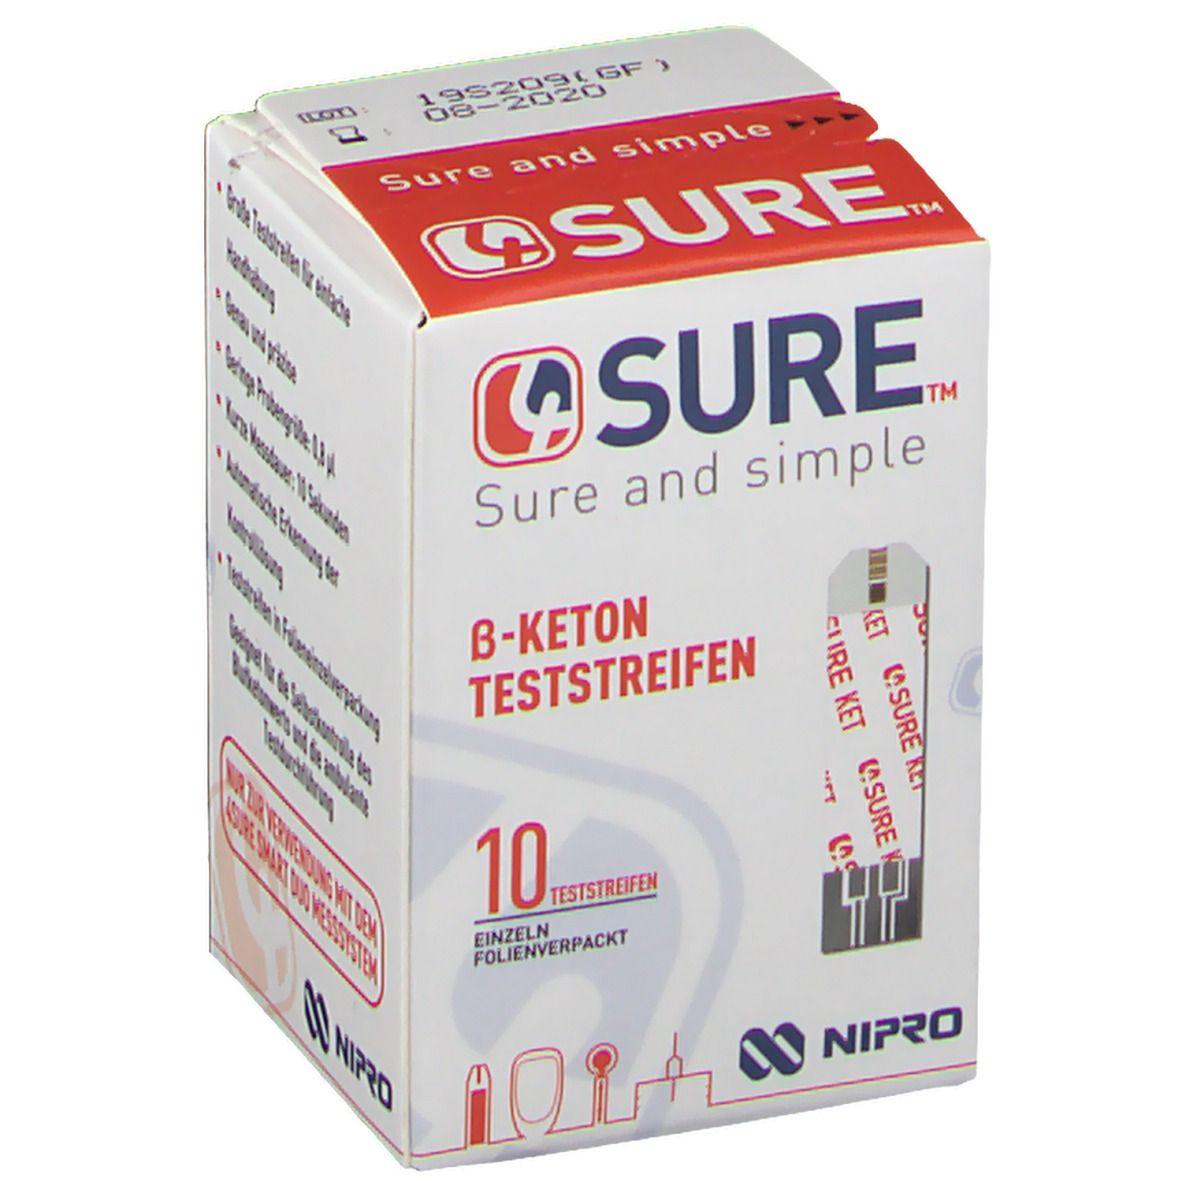 4SURE β-Keton Teststreifen